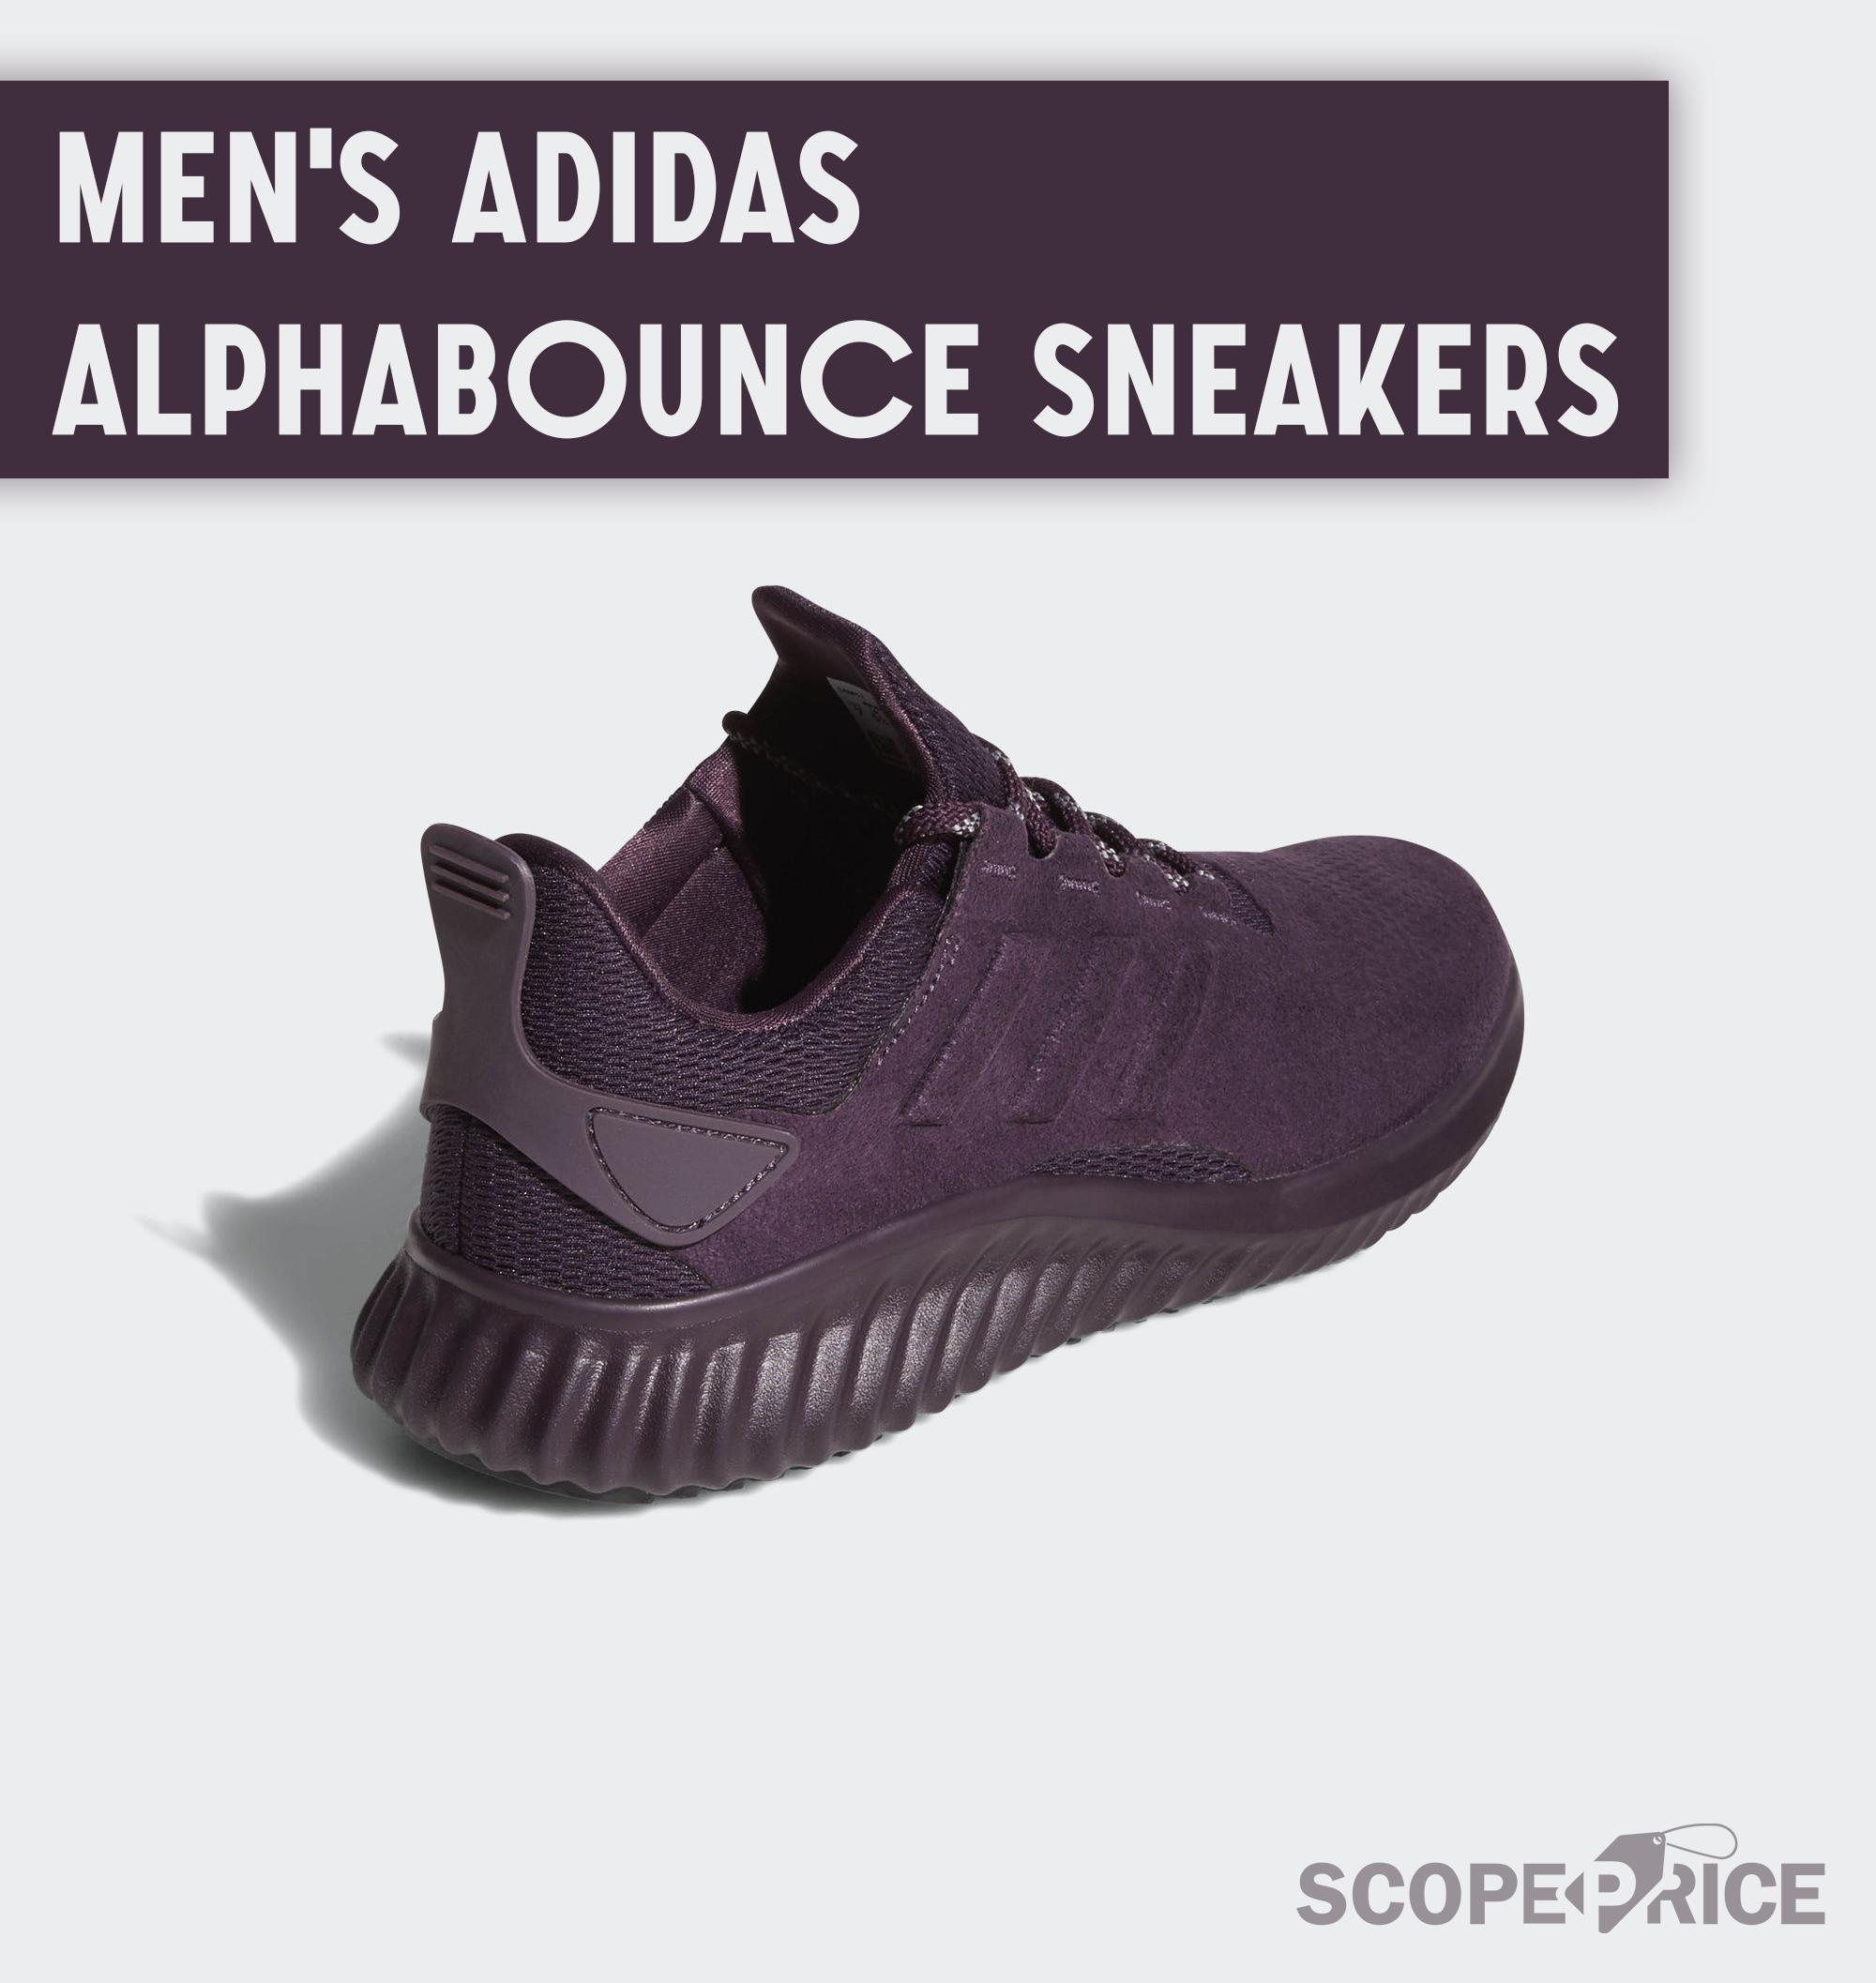 Calma recoger Buena suerte  Scope the right price for your adidas Alphabounce City Shoes Men's ...